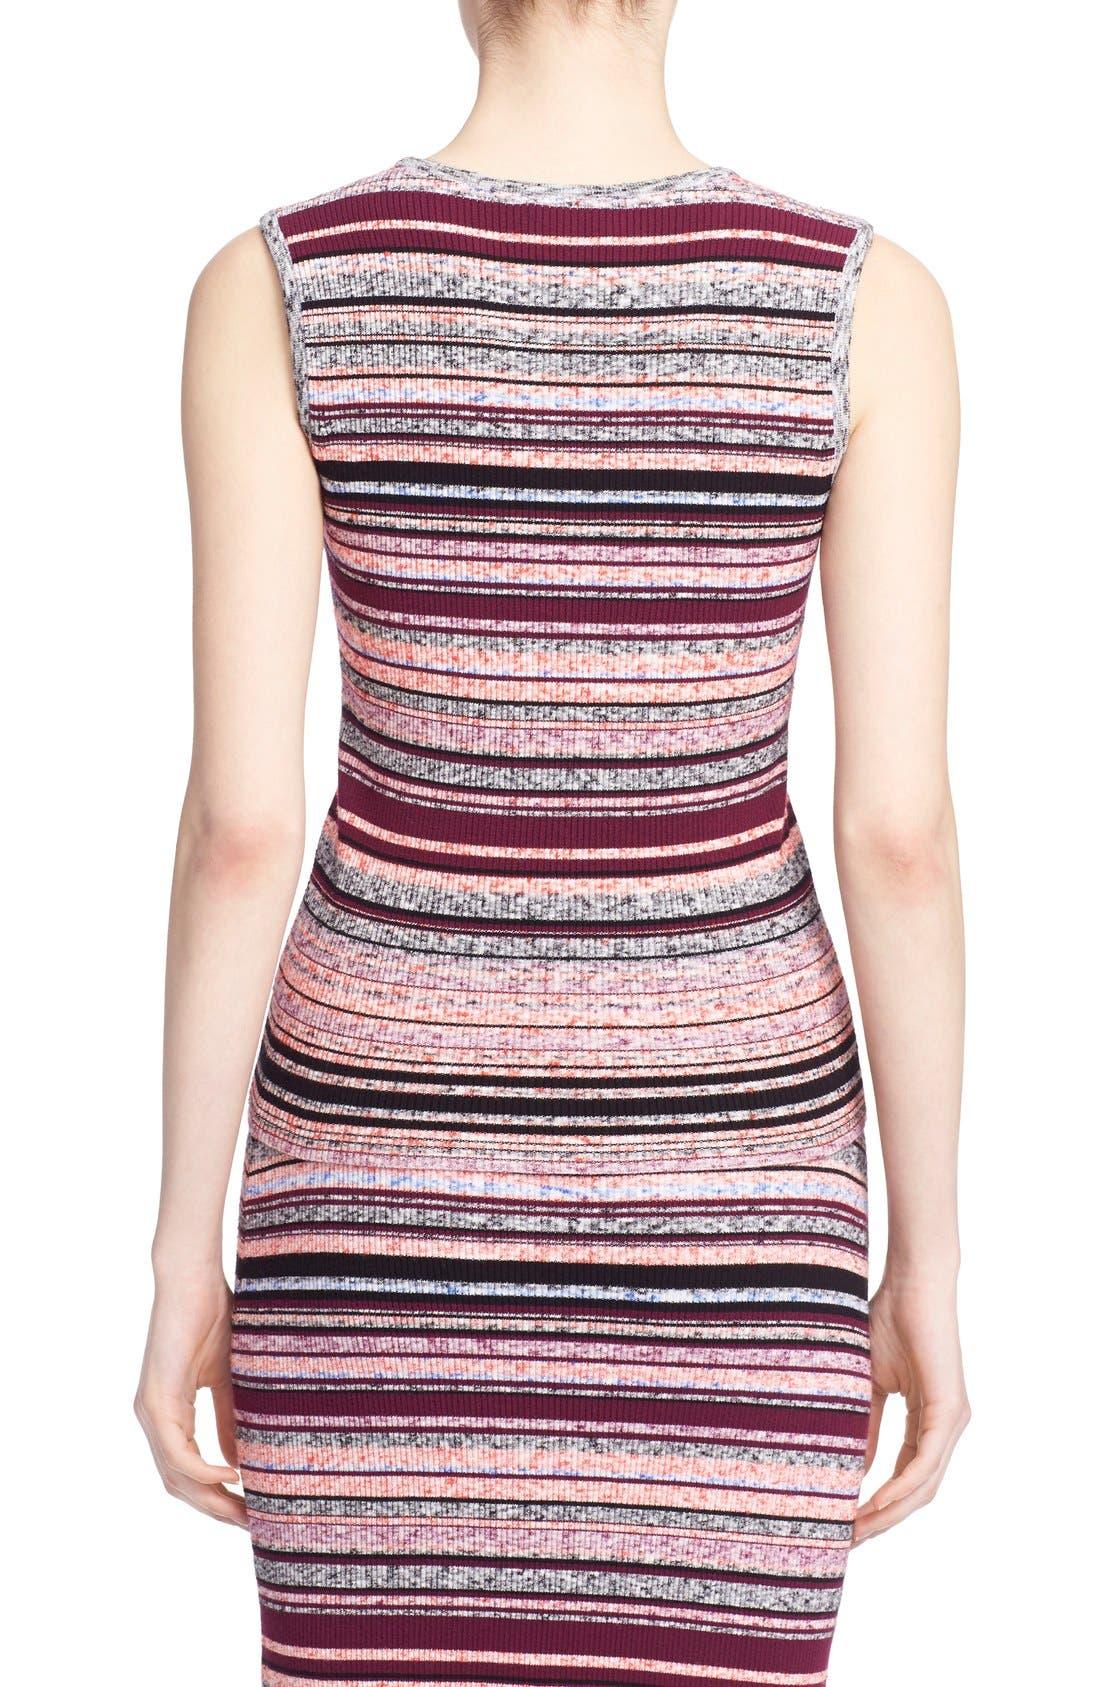 'Ash' Stripe Sleeveless Ribbed Top,                             Alternate thumbnail 6, color,                             930